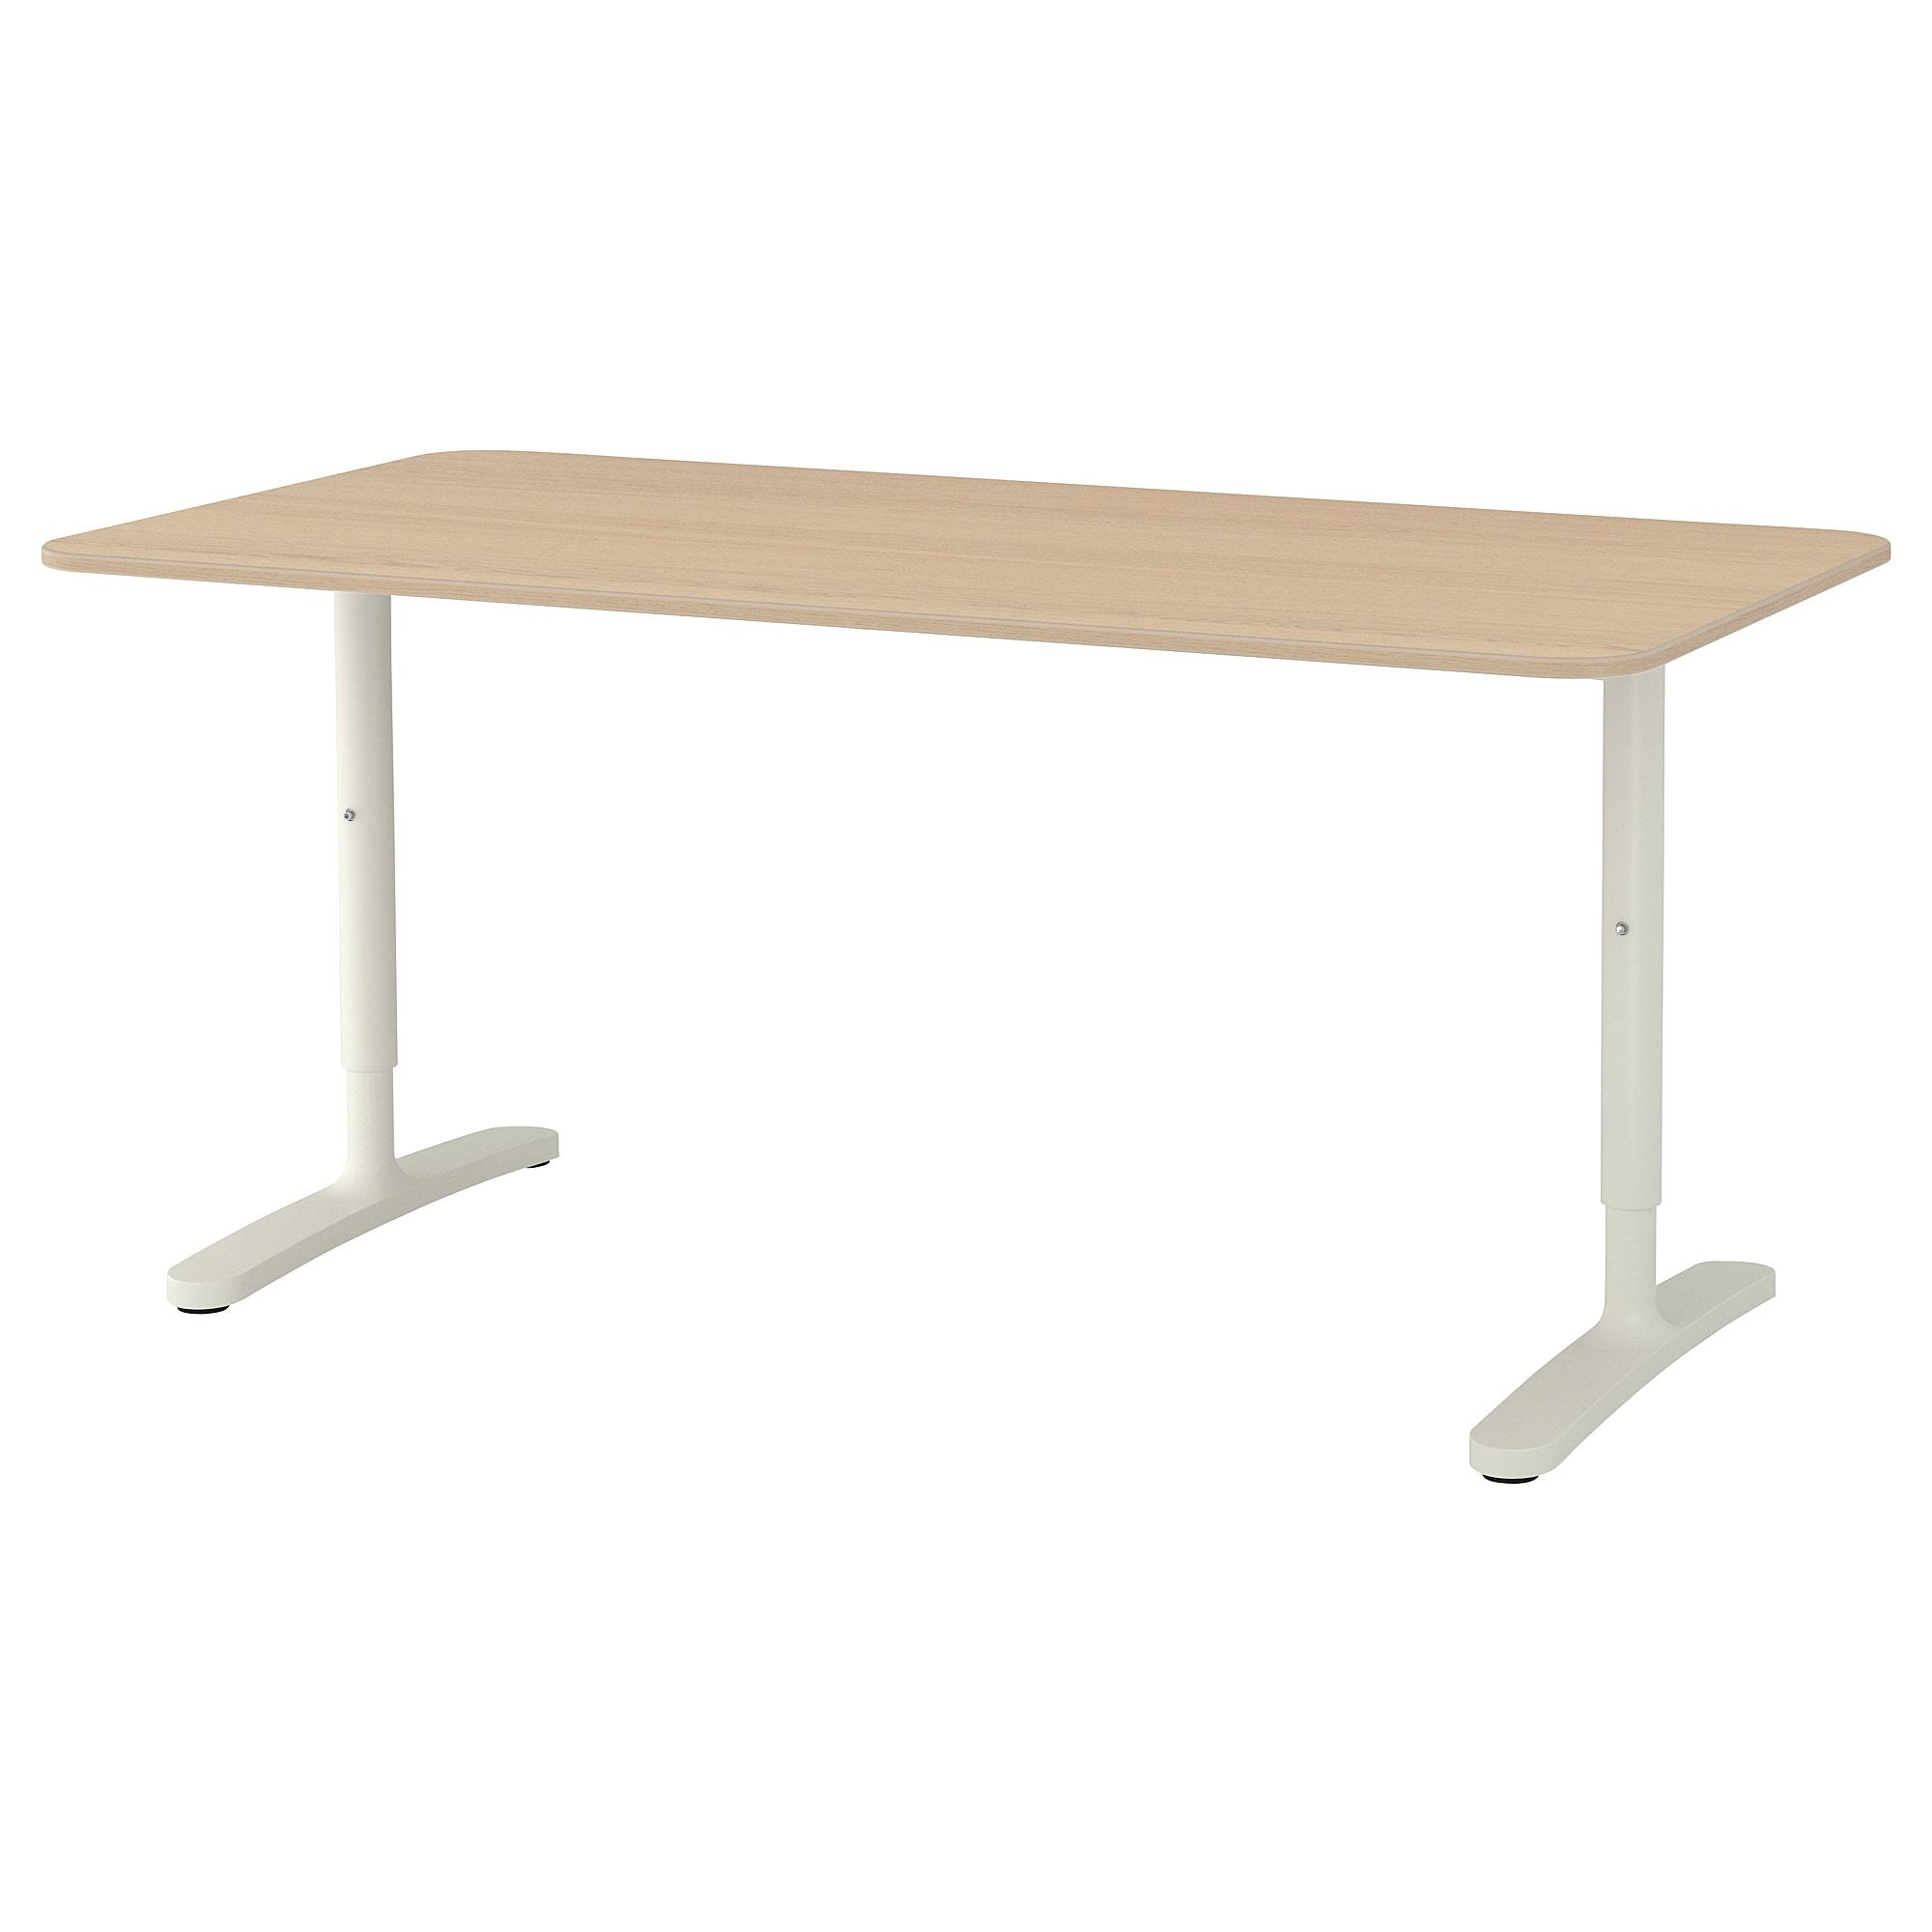 Bekant Desks For Stationary Computers Ikea White Desks Ikea Ikea Bekant Desk